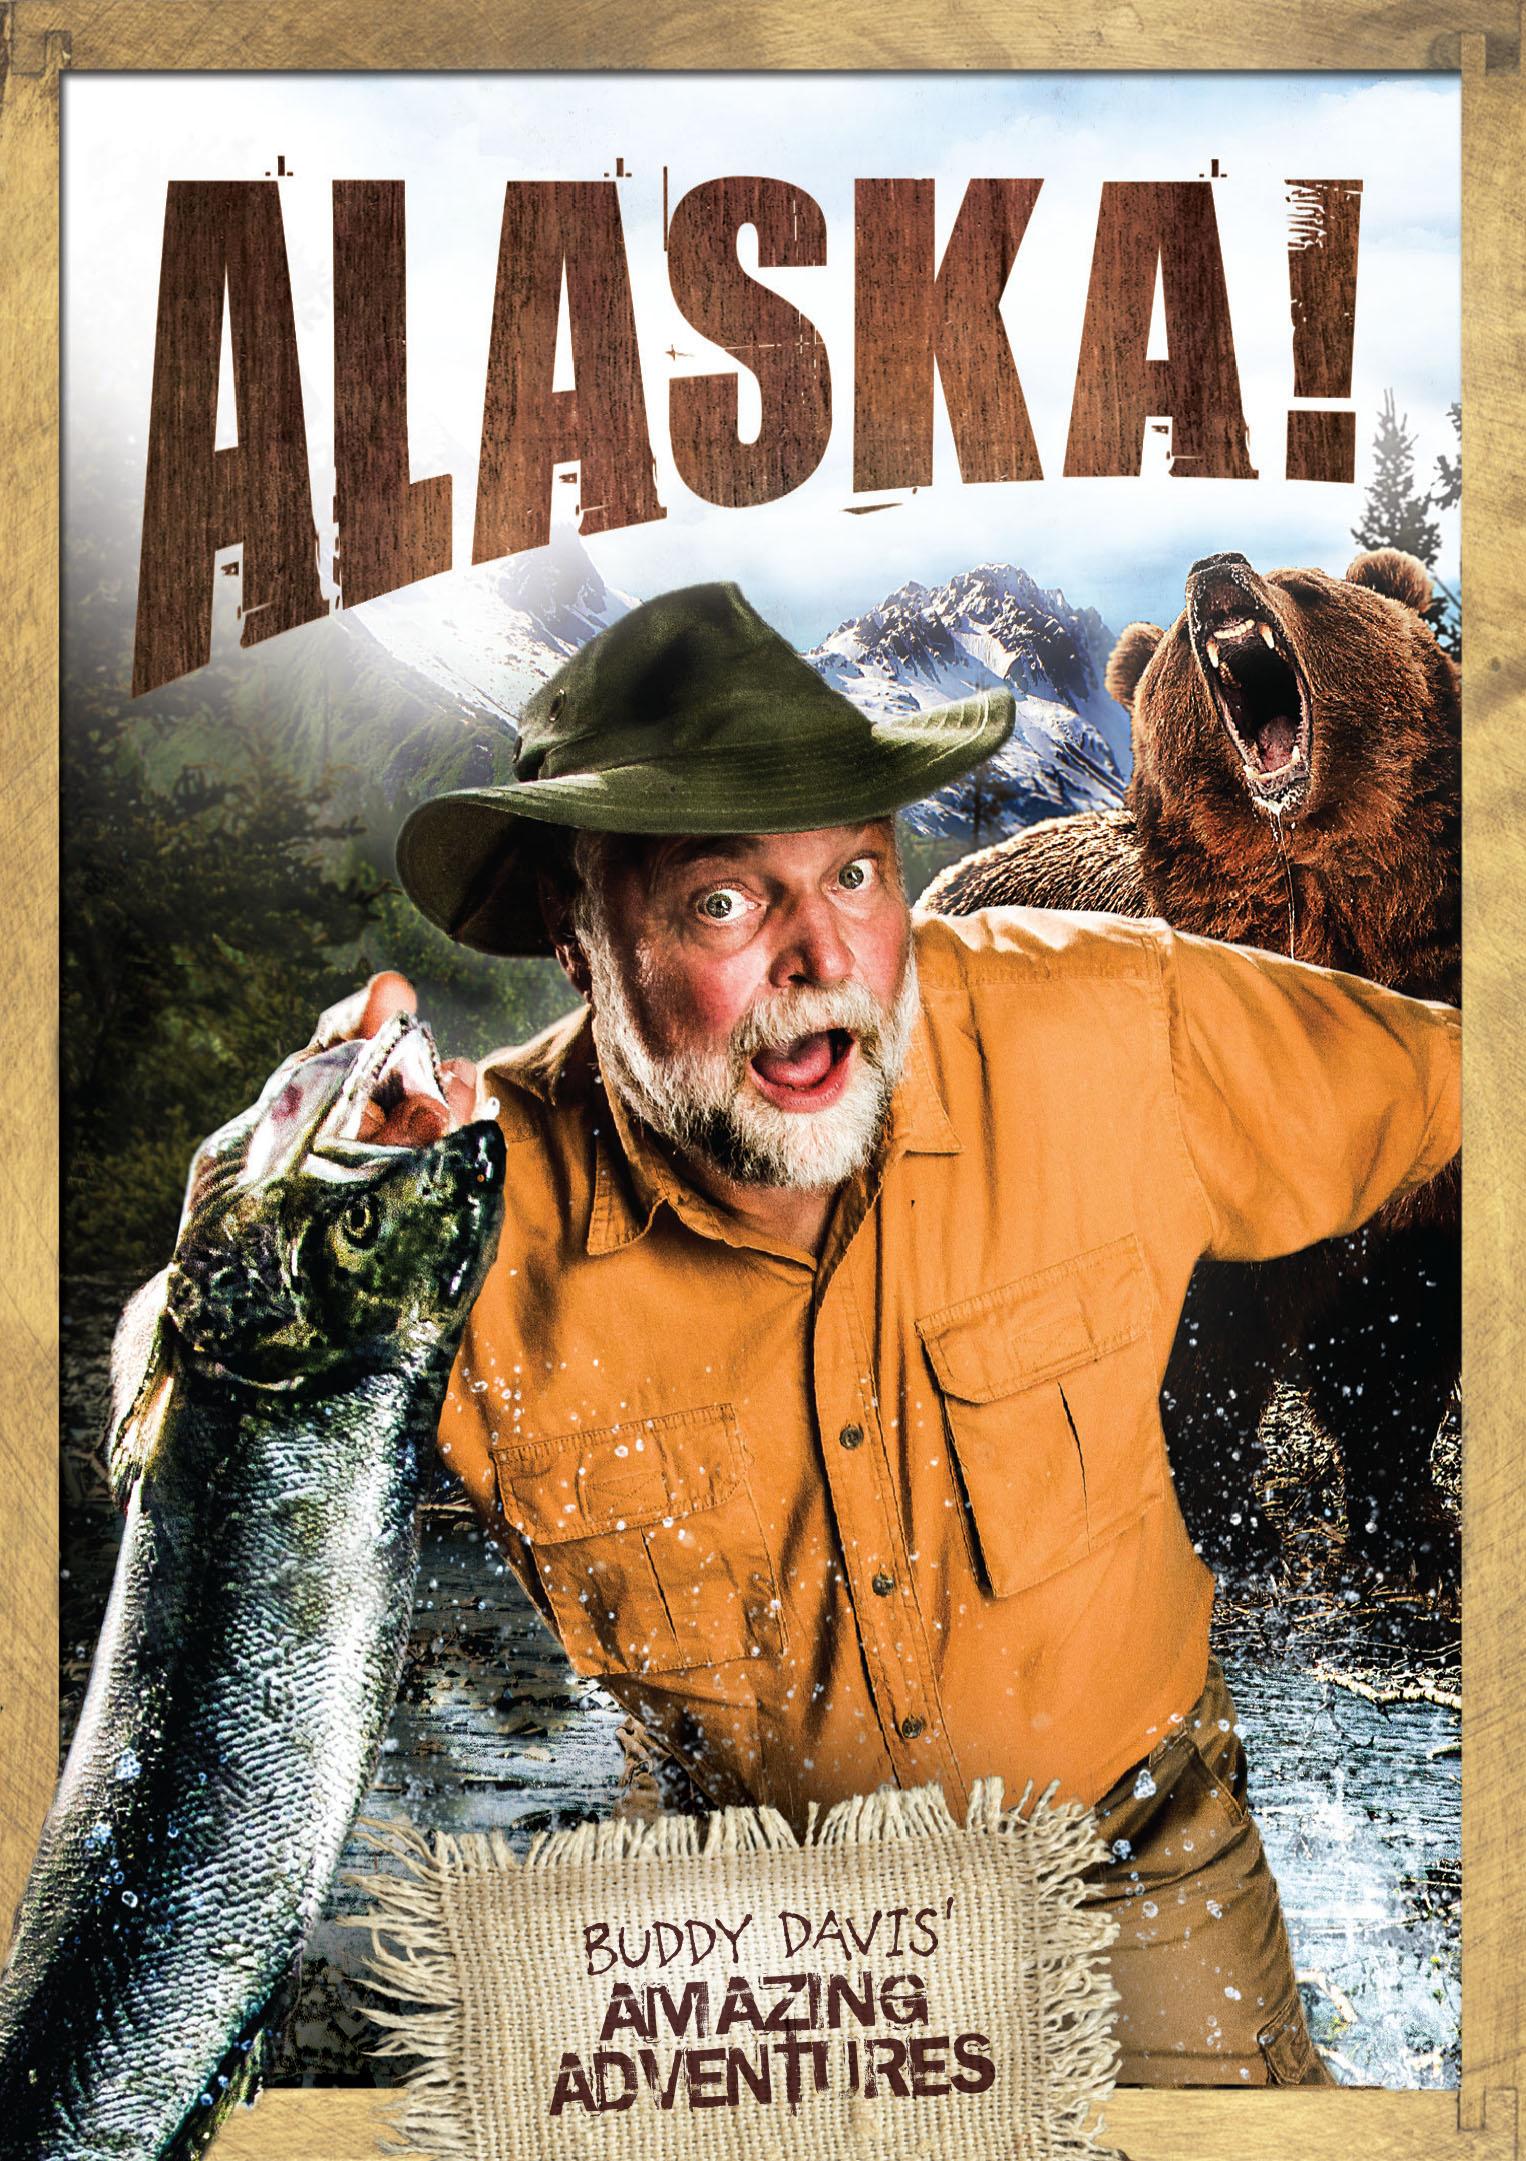 Buddy Davis' Alaska Adventure